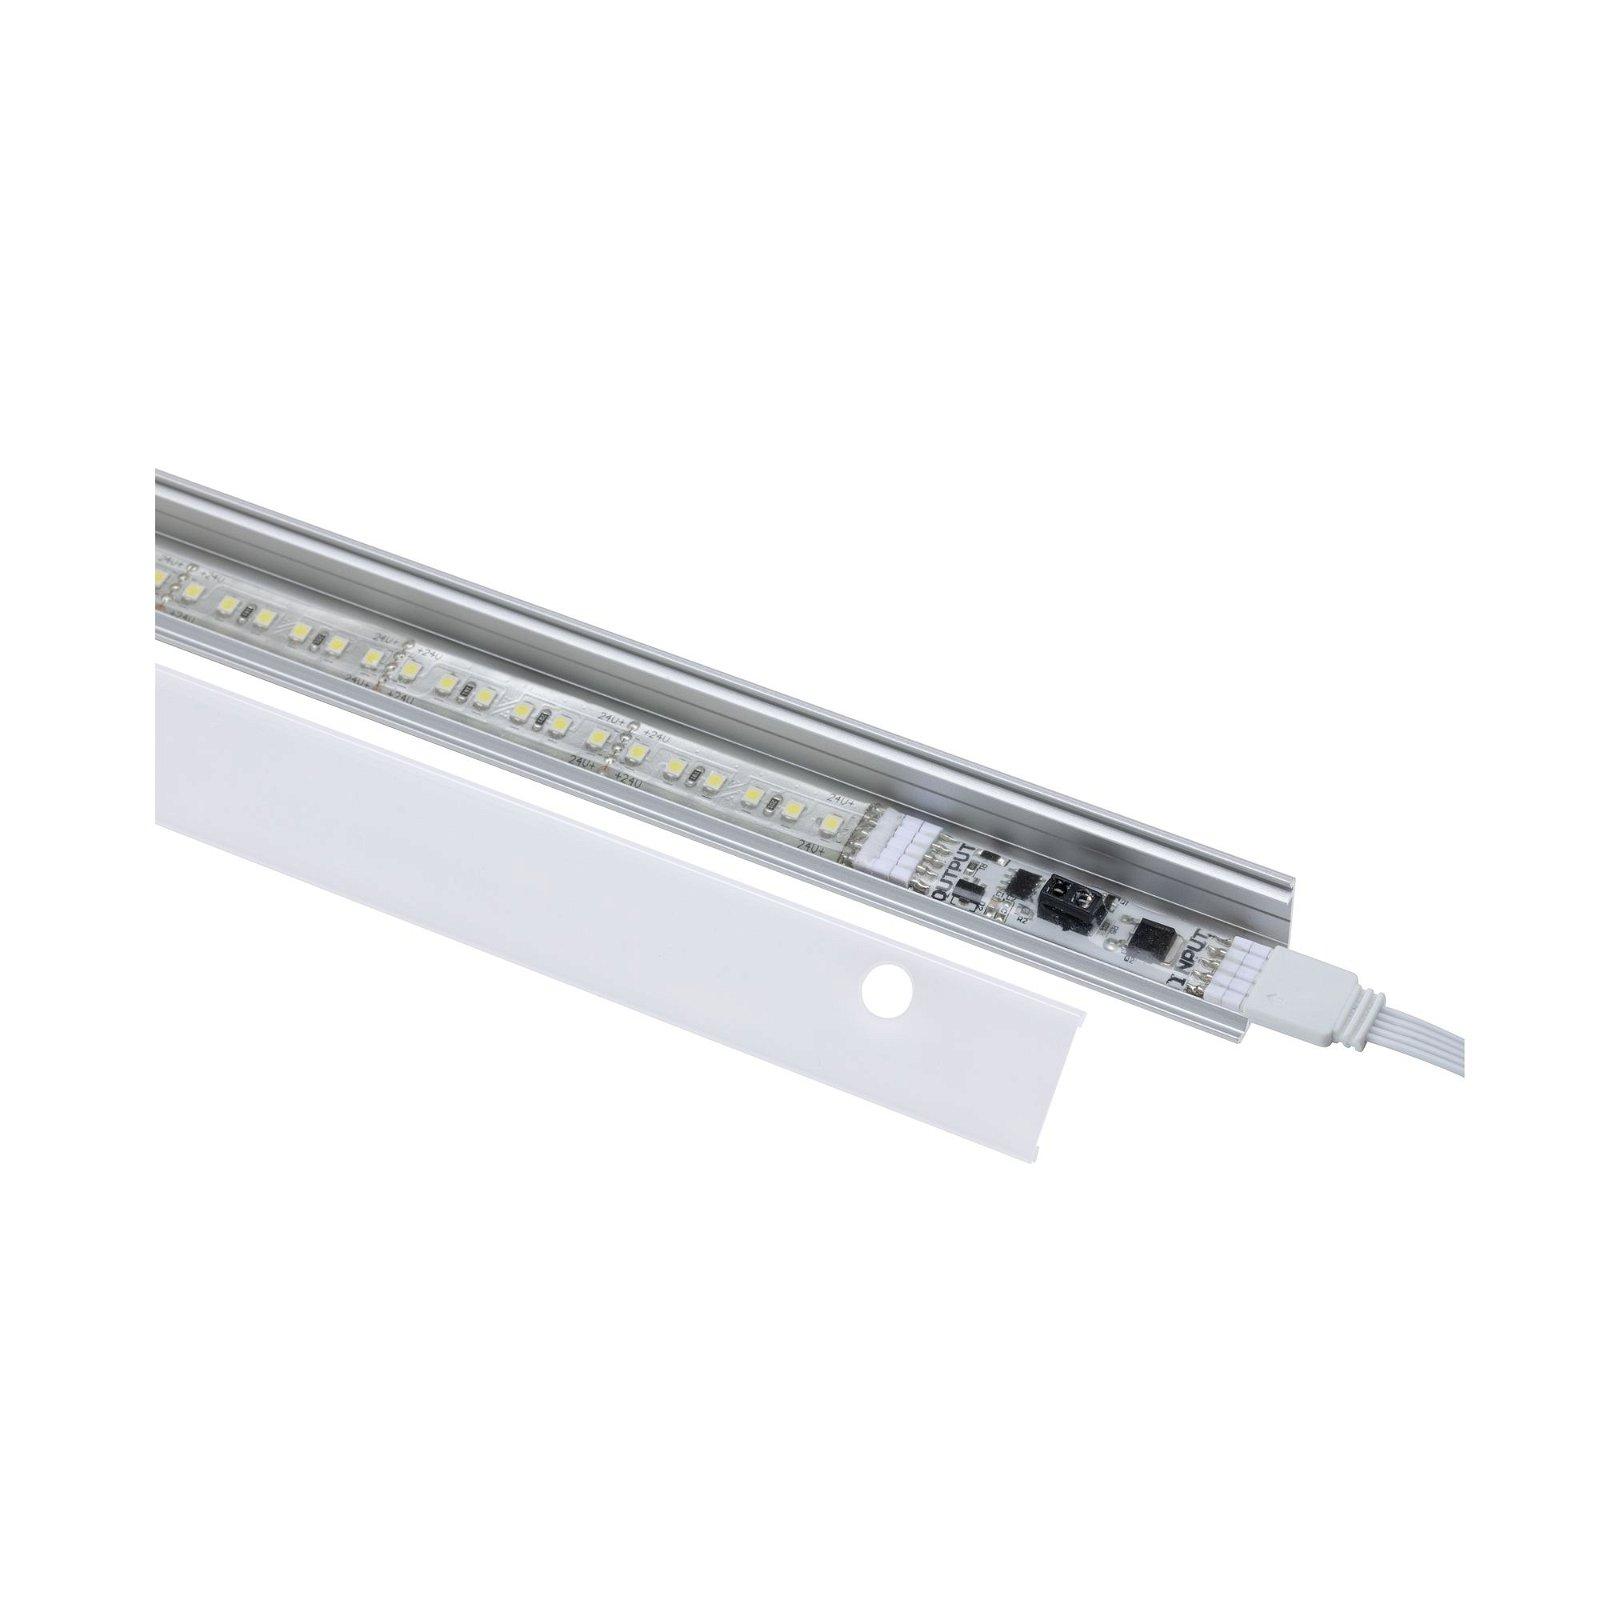 MaxLED Capteur Capteur Dimm Switch DC 24V max. 144W Blanc